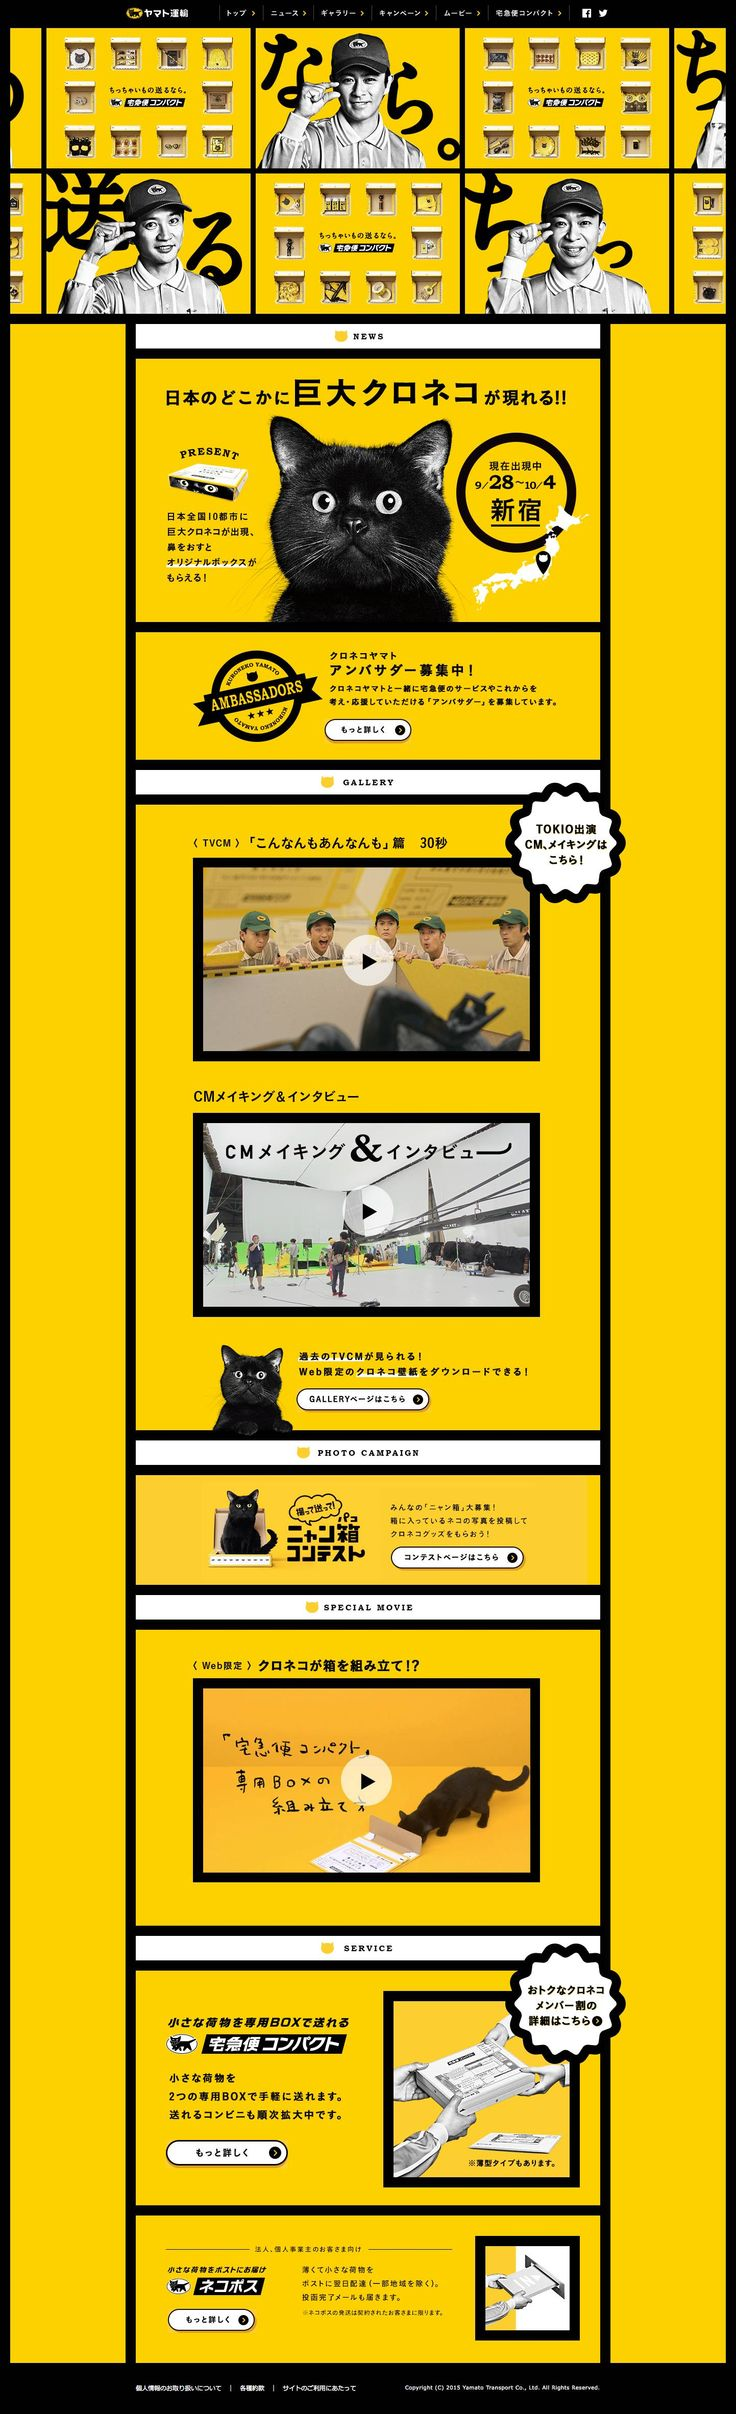 http://www.kuronekoyamato.co.jp/campaign/compactcmp/index.html